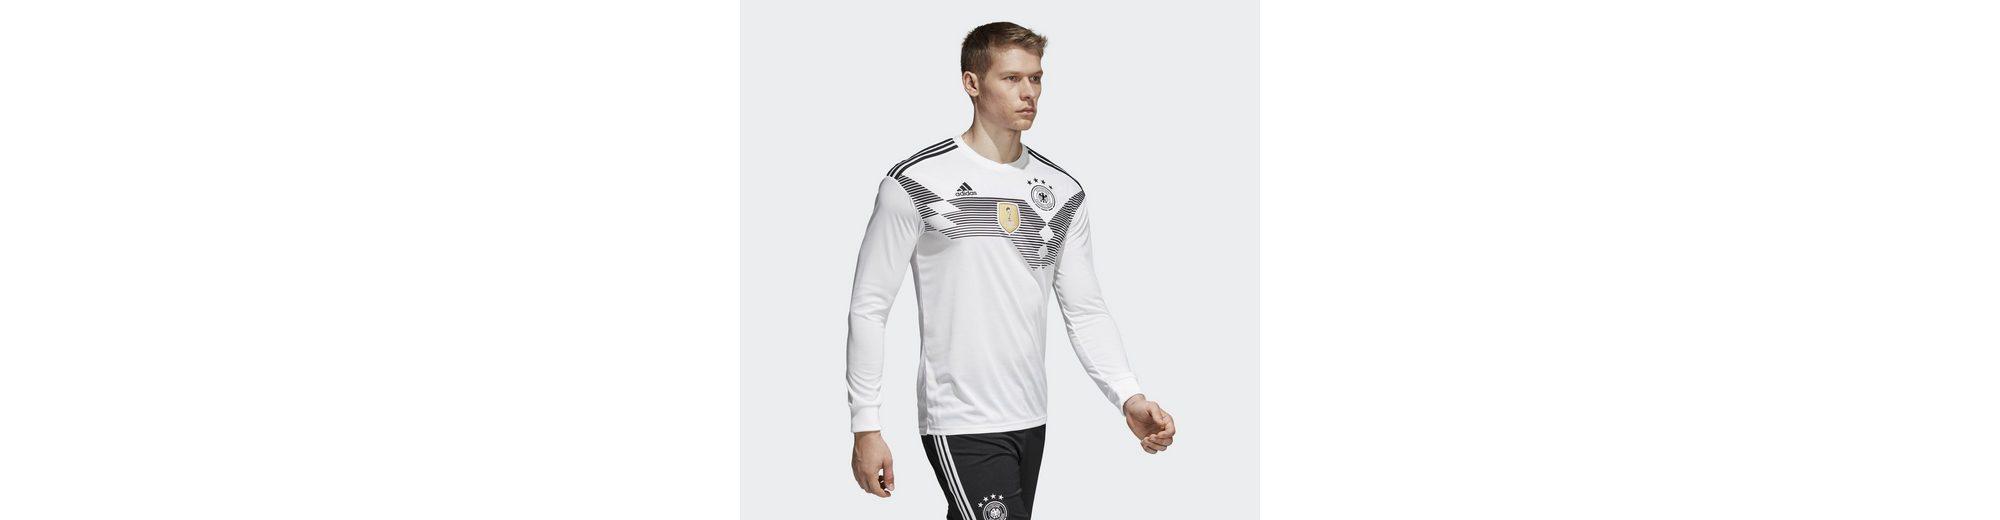 Angebote Günstig Online adidas Performance Footballtrikot DFB Heimtrikot Replica Billig Günstig Kaufen Wahl 9ym8Q